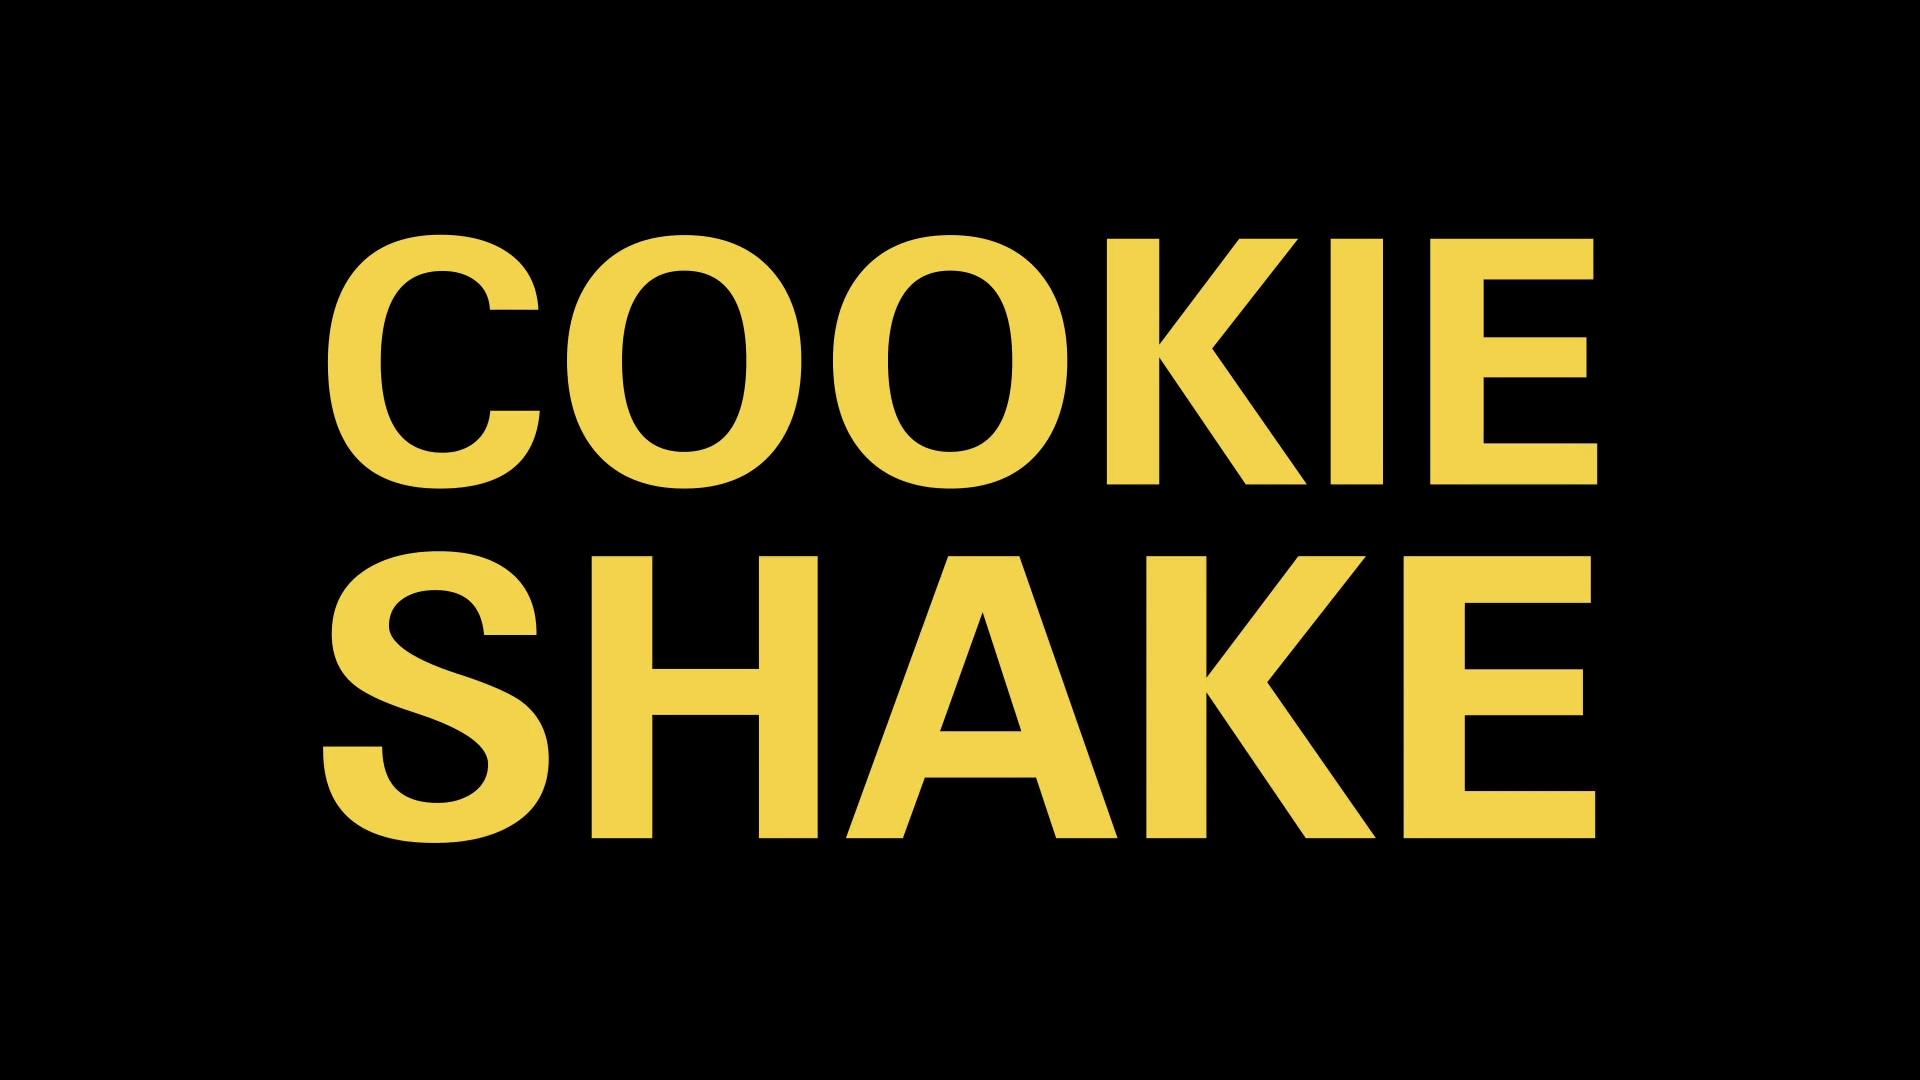 HAMILTON_BEACH_CookieShake_final_01_04